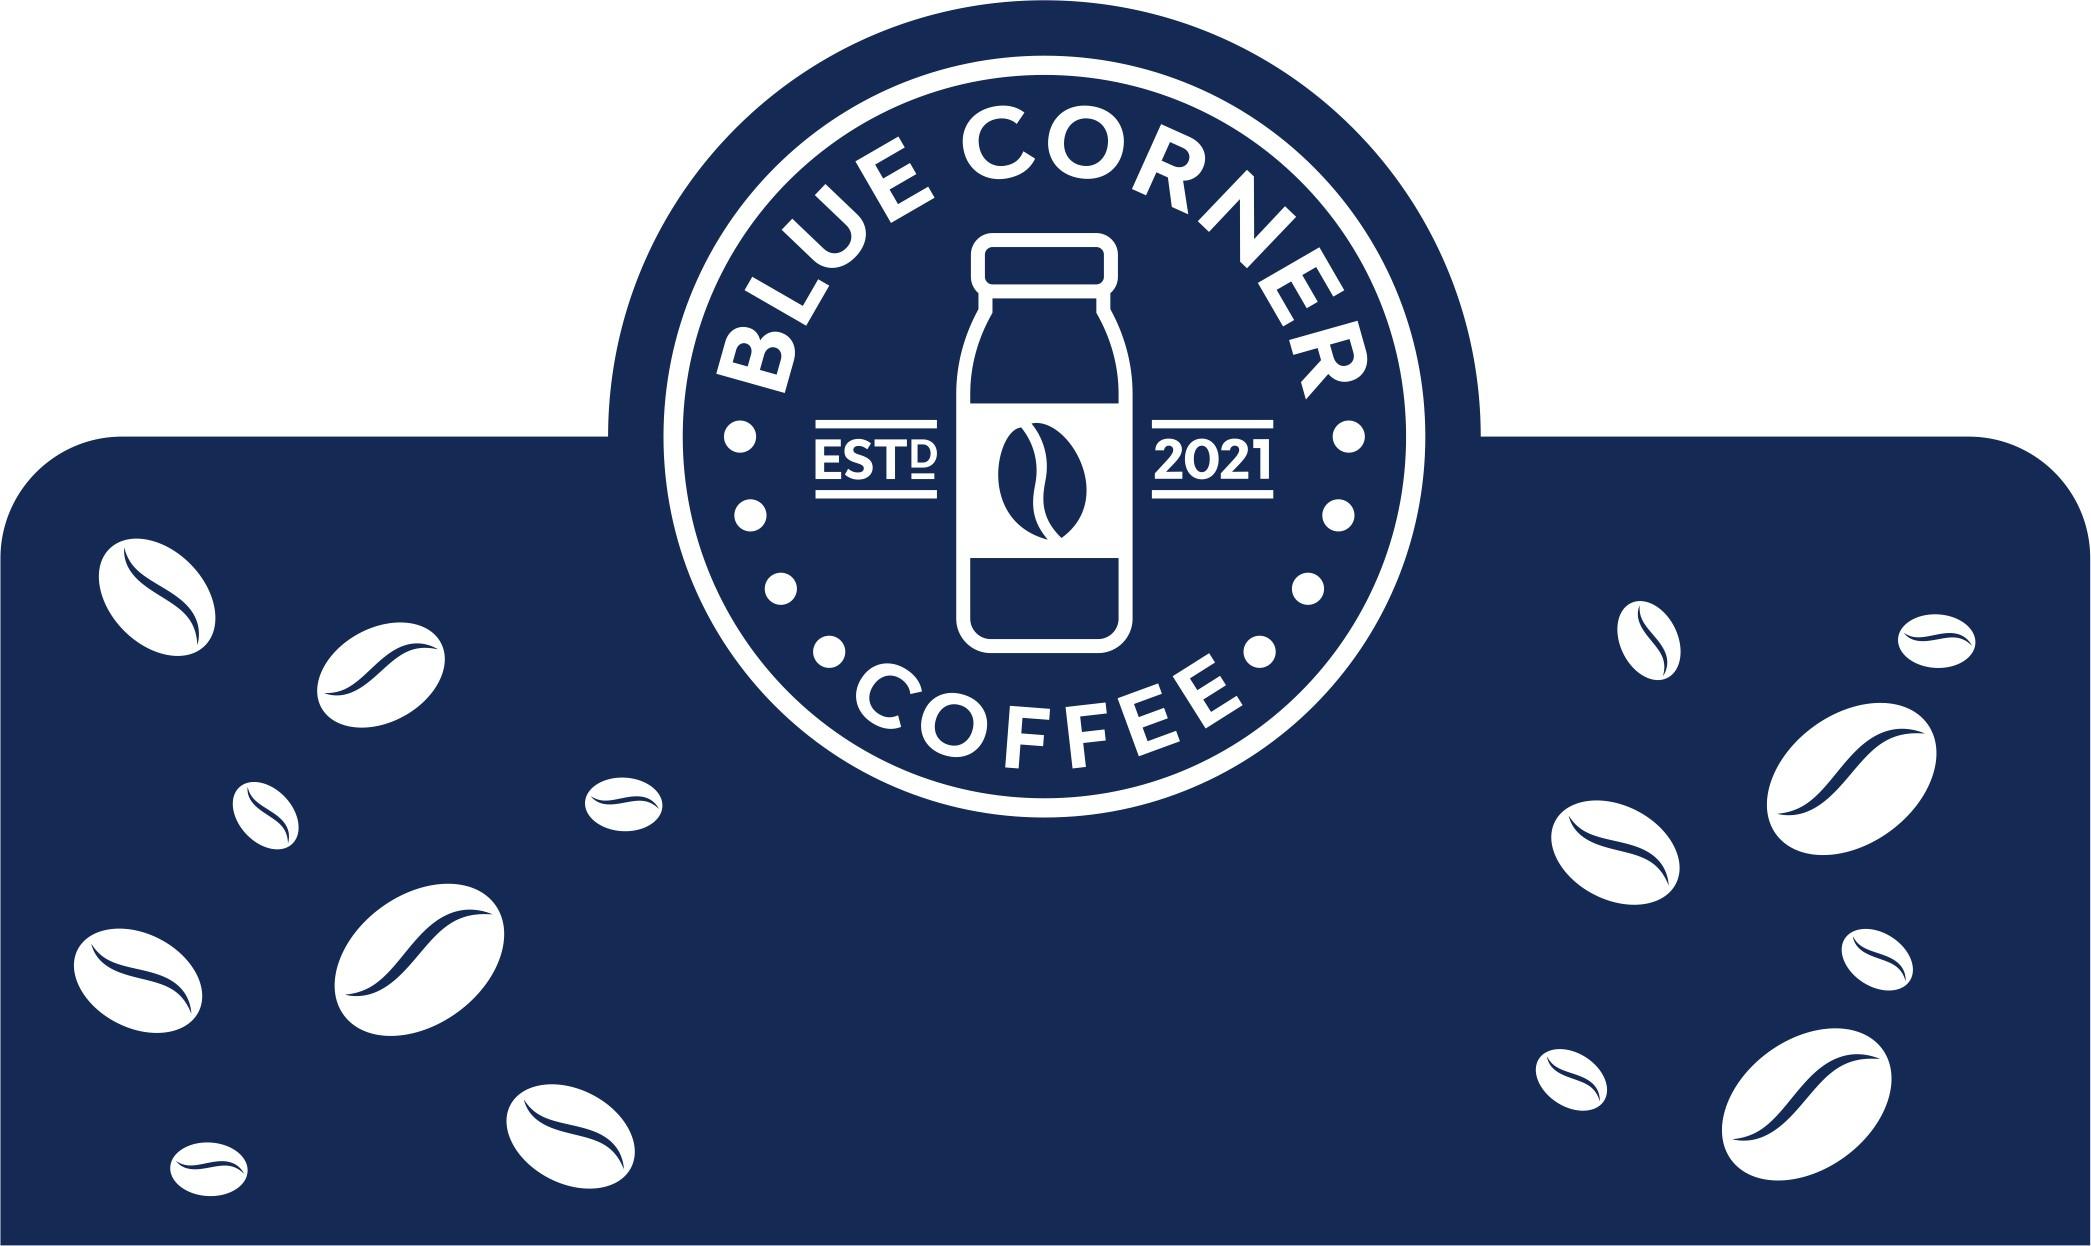 Packaging design for Blue Corner Coffee